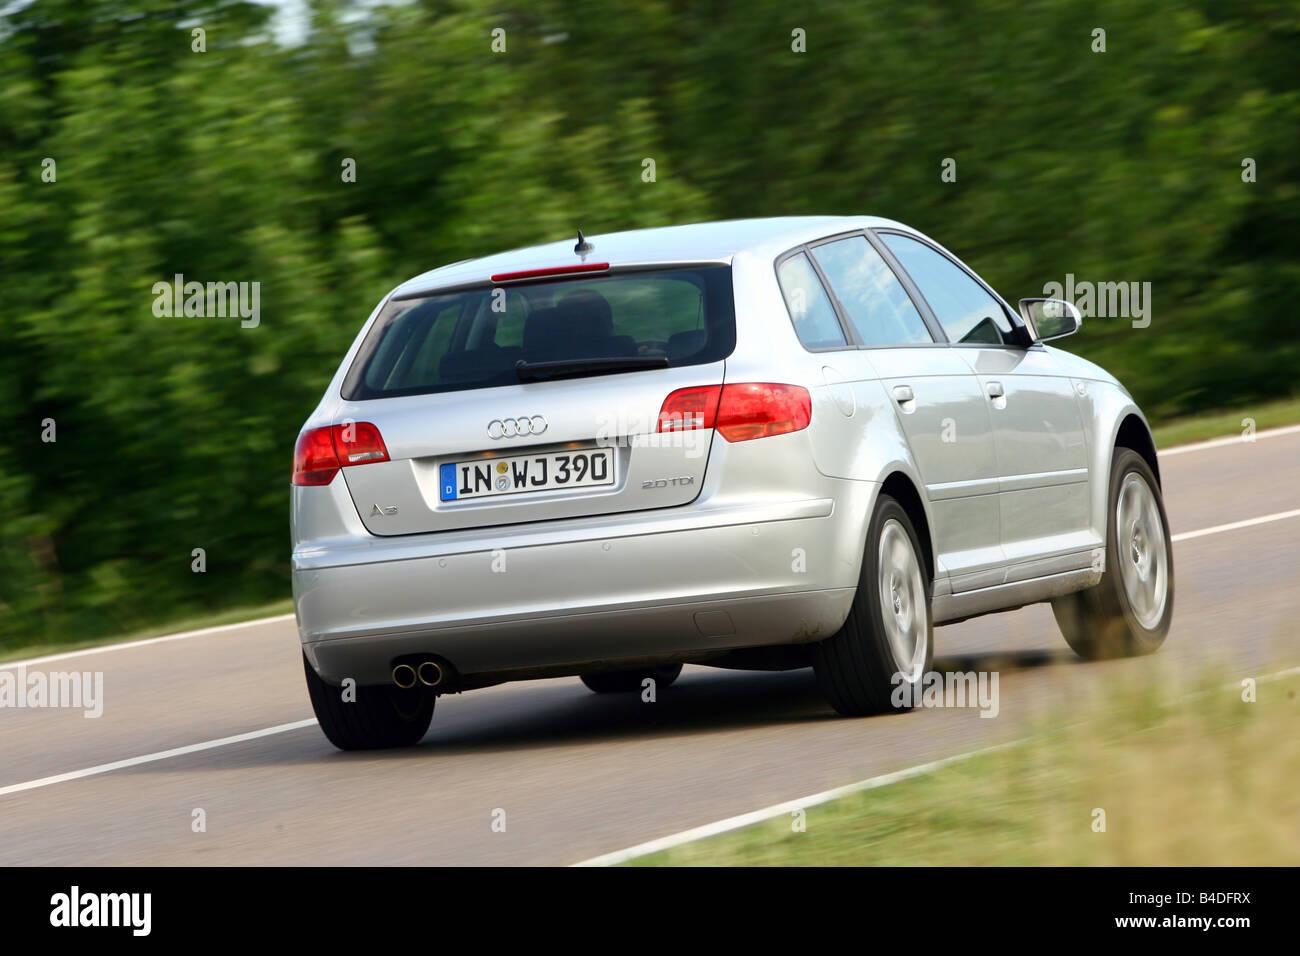 Audi A3 Sportback 2 0 Tdi Ambition  Model Year 2007-  Silver Stock Photo  19966798